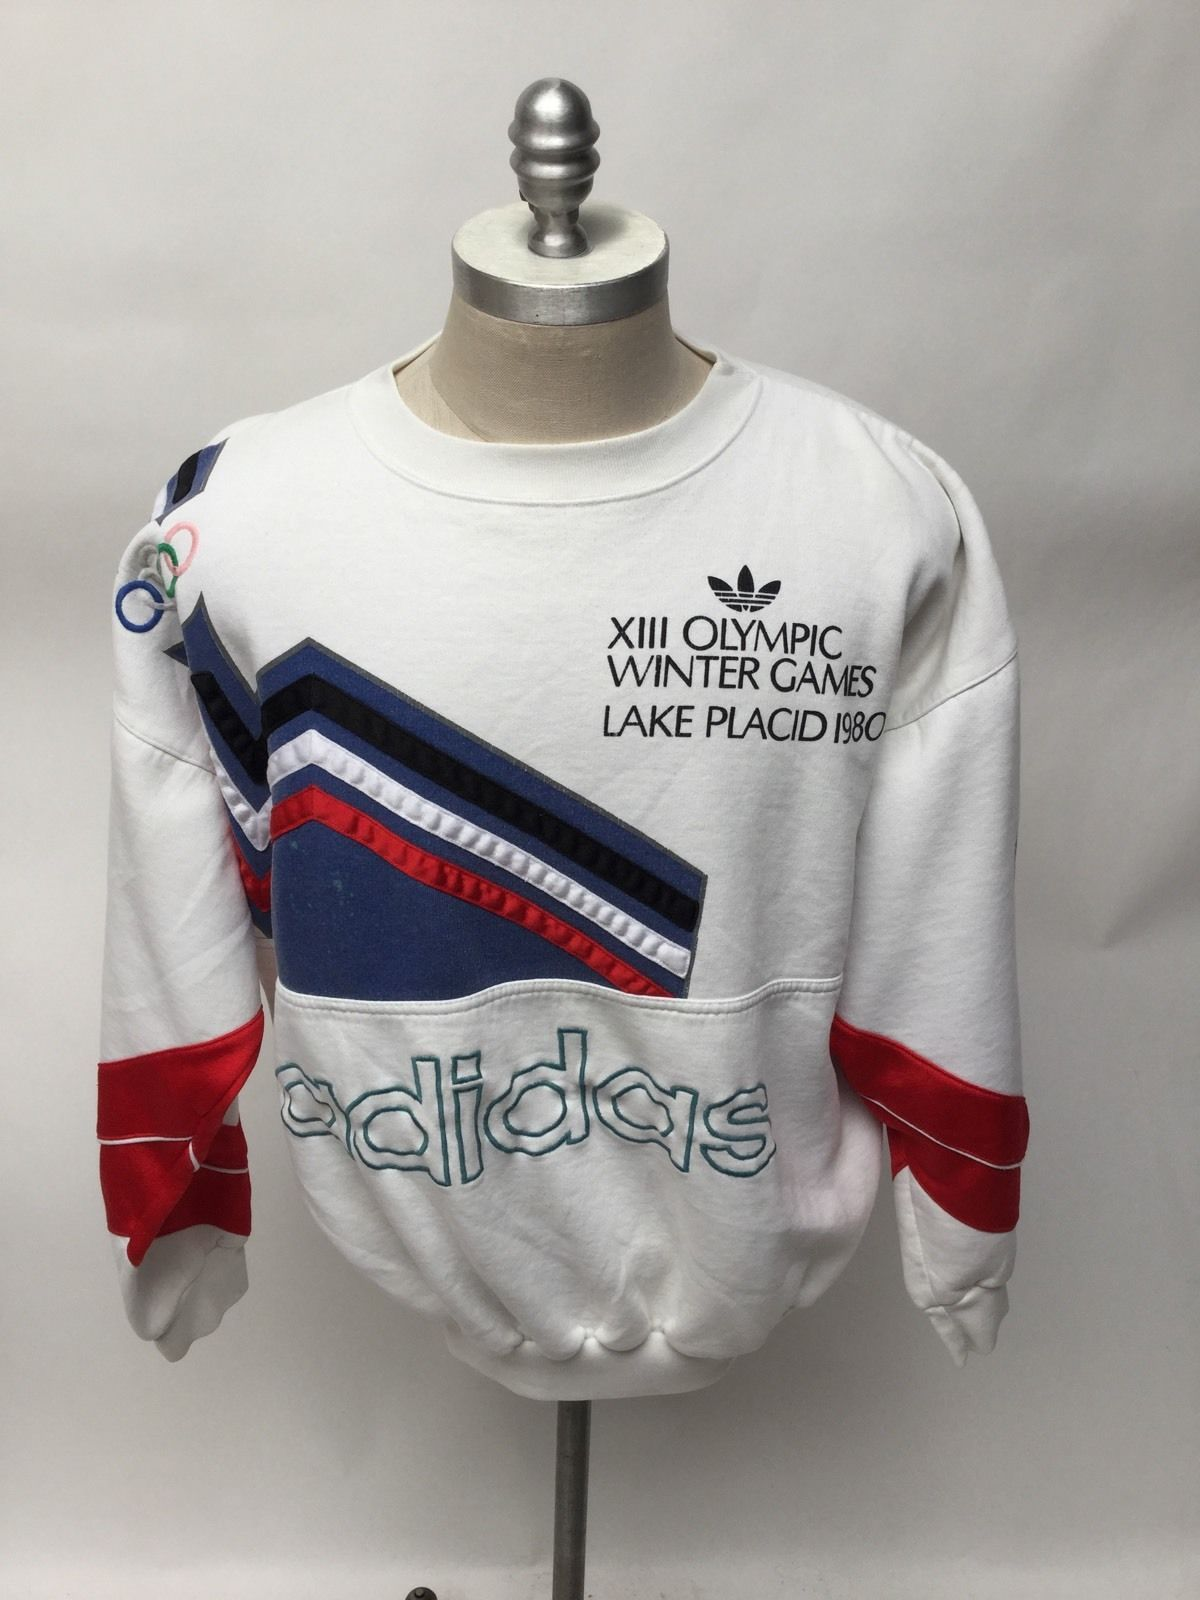 Vtg Adidas Lake Placid 1990 Sweatshirt 80s Olympics